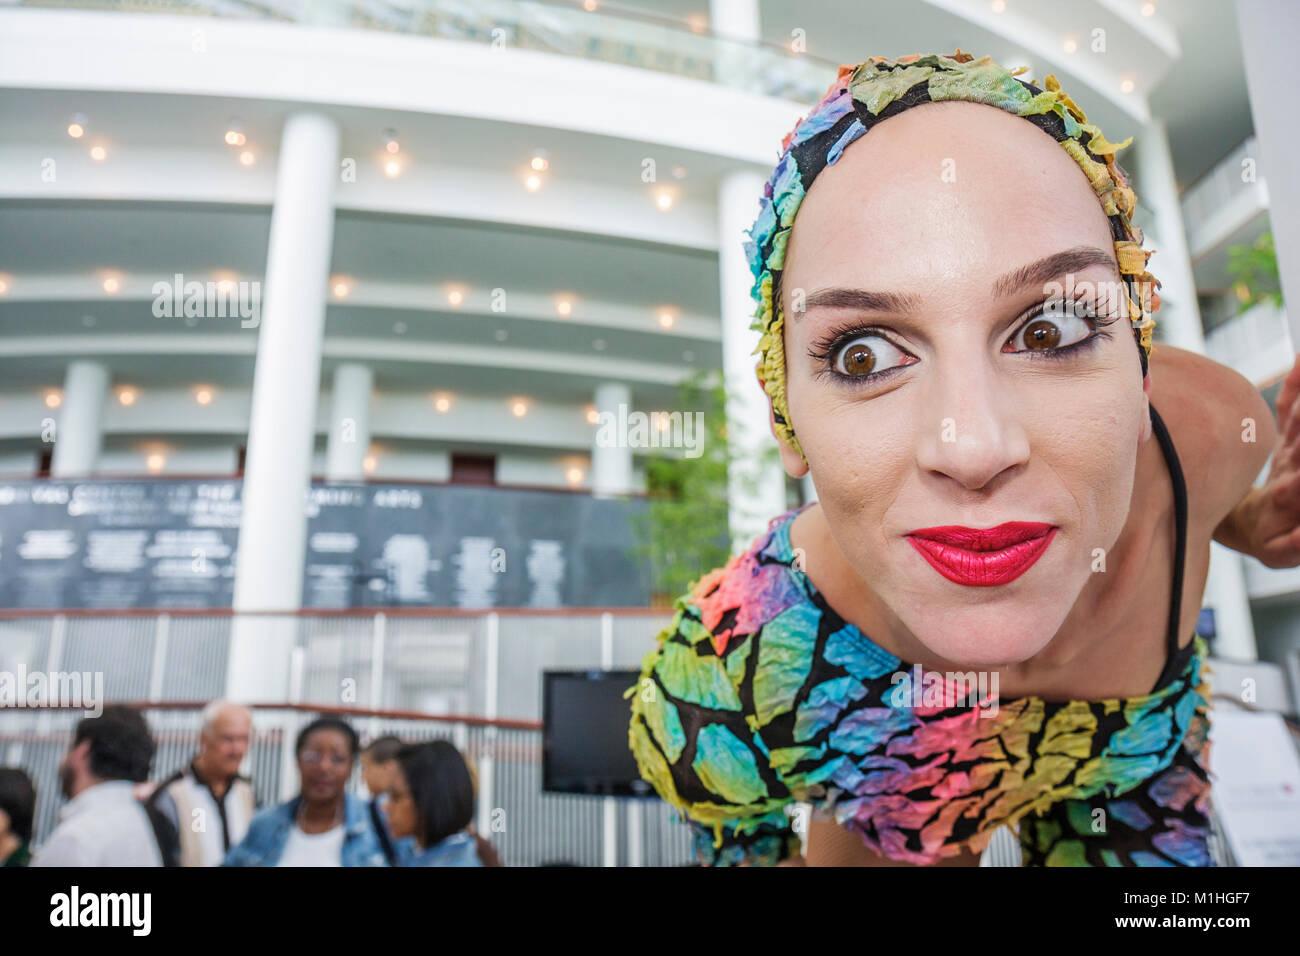 Ziff Opera House female performer stilts make up face eyes eyeballs - Stock Image